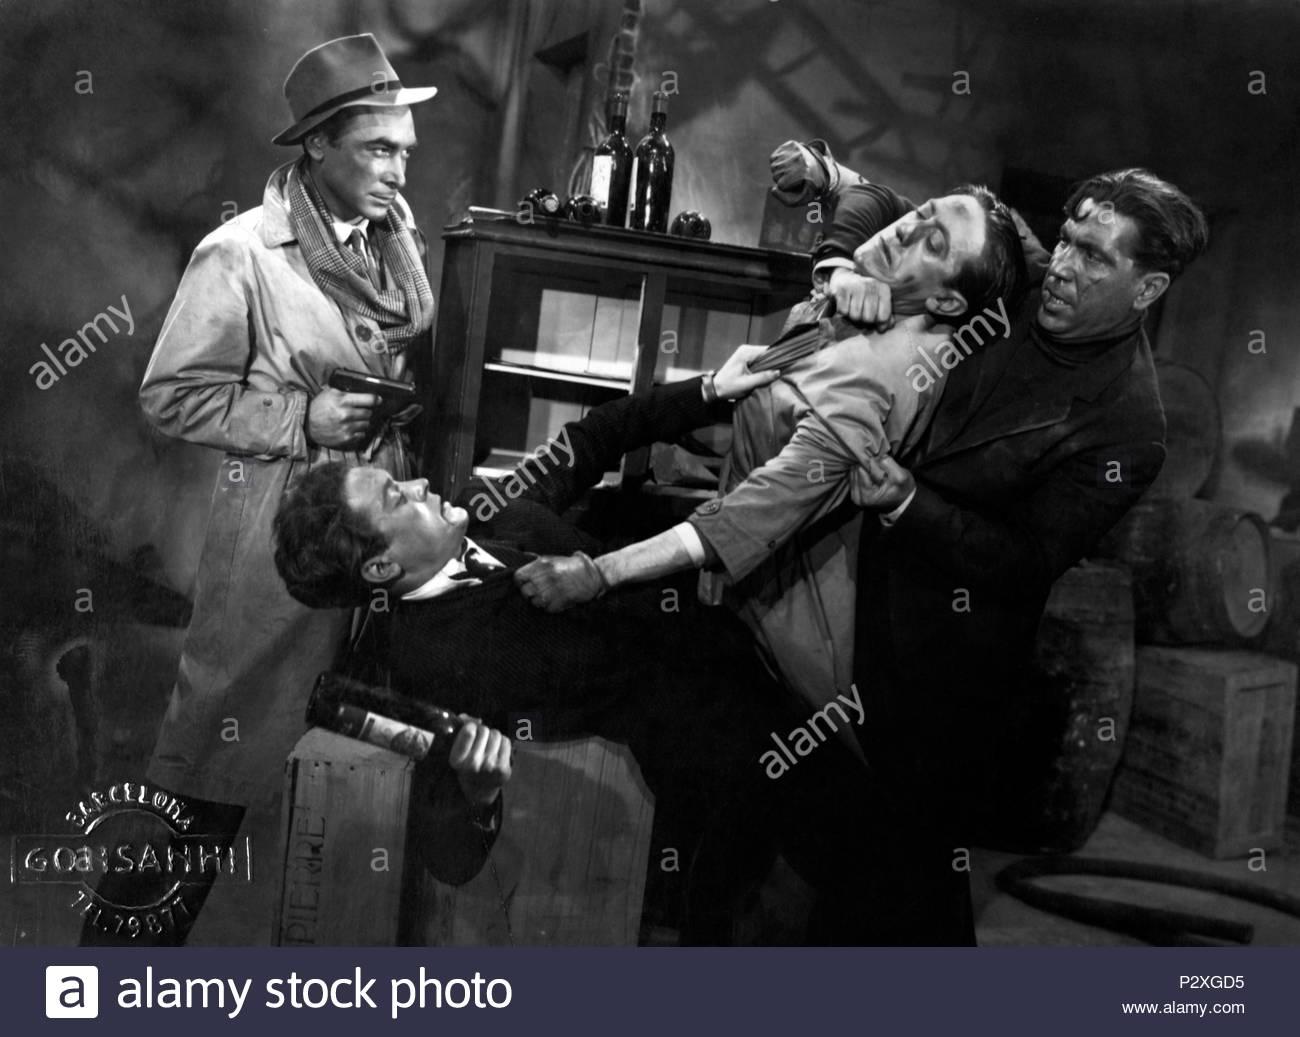 Original Film Title: HOMBRES SIN HONOR.  English Title: HOMBRES SIN HONOR.  Film Director: IGNACIO F. IQUINO.  Year: 1944. Credit: EMISORA FILMS / Album - Stock Image